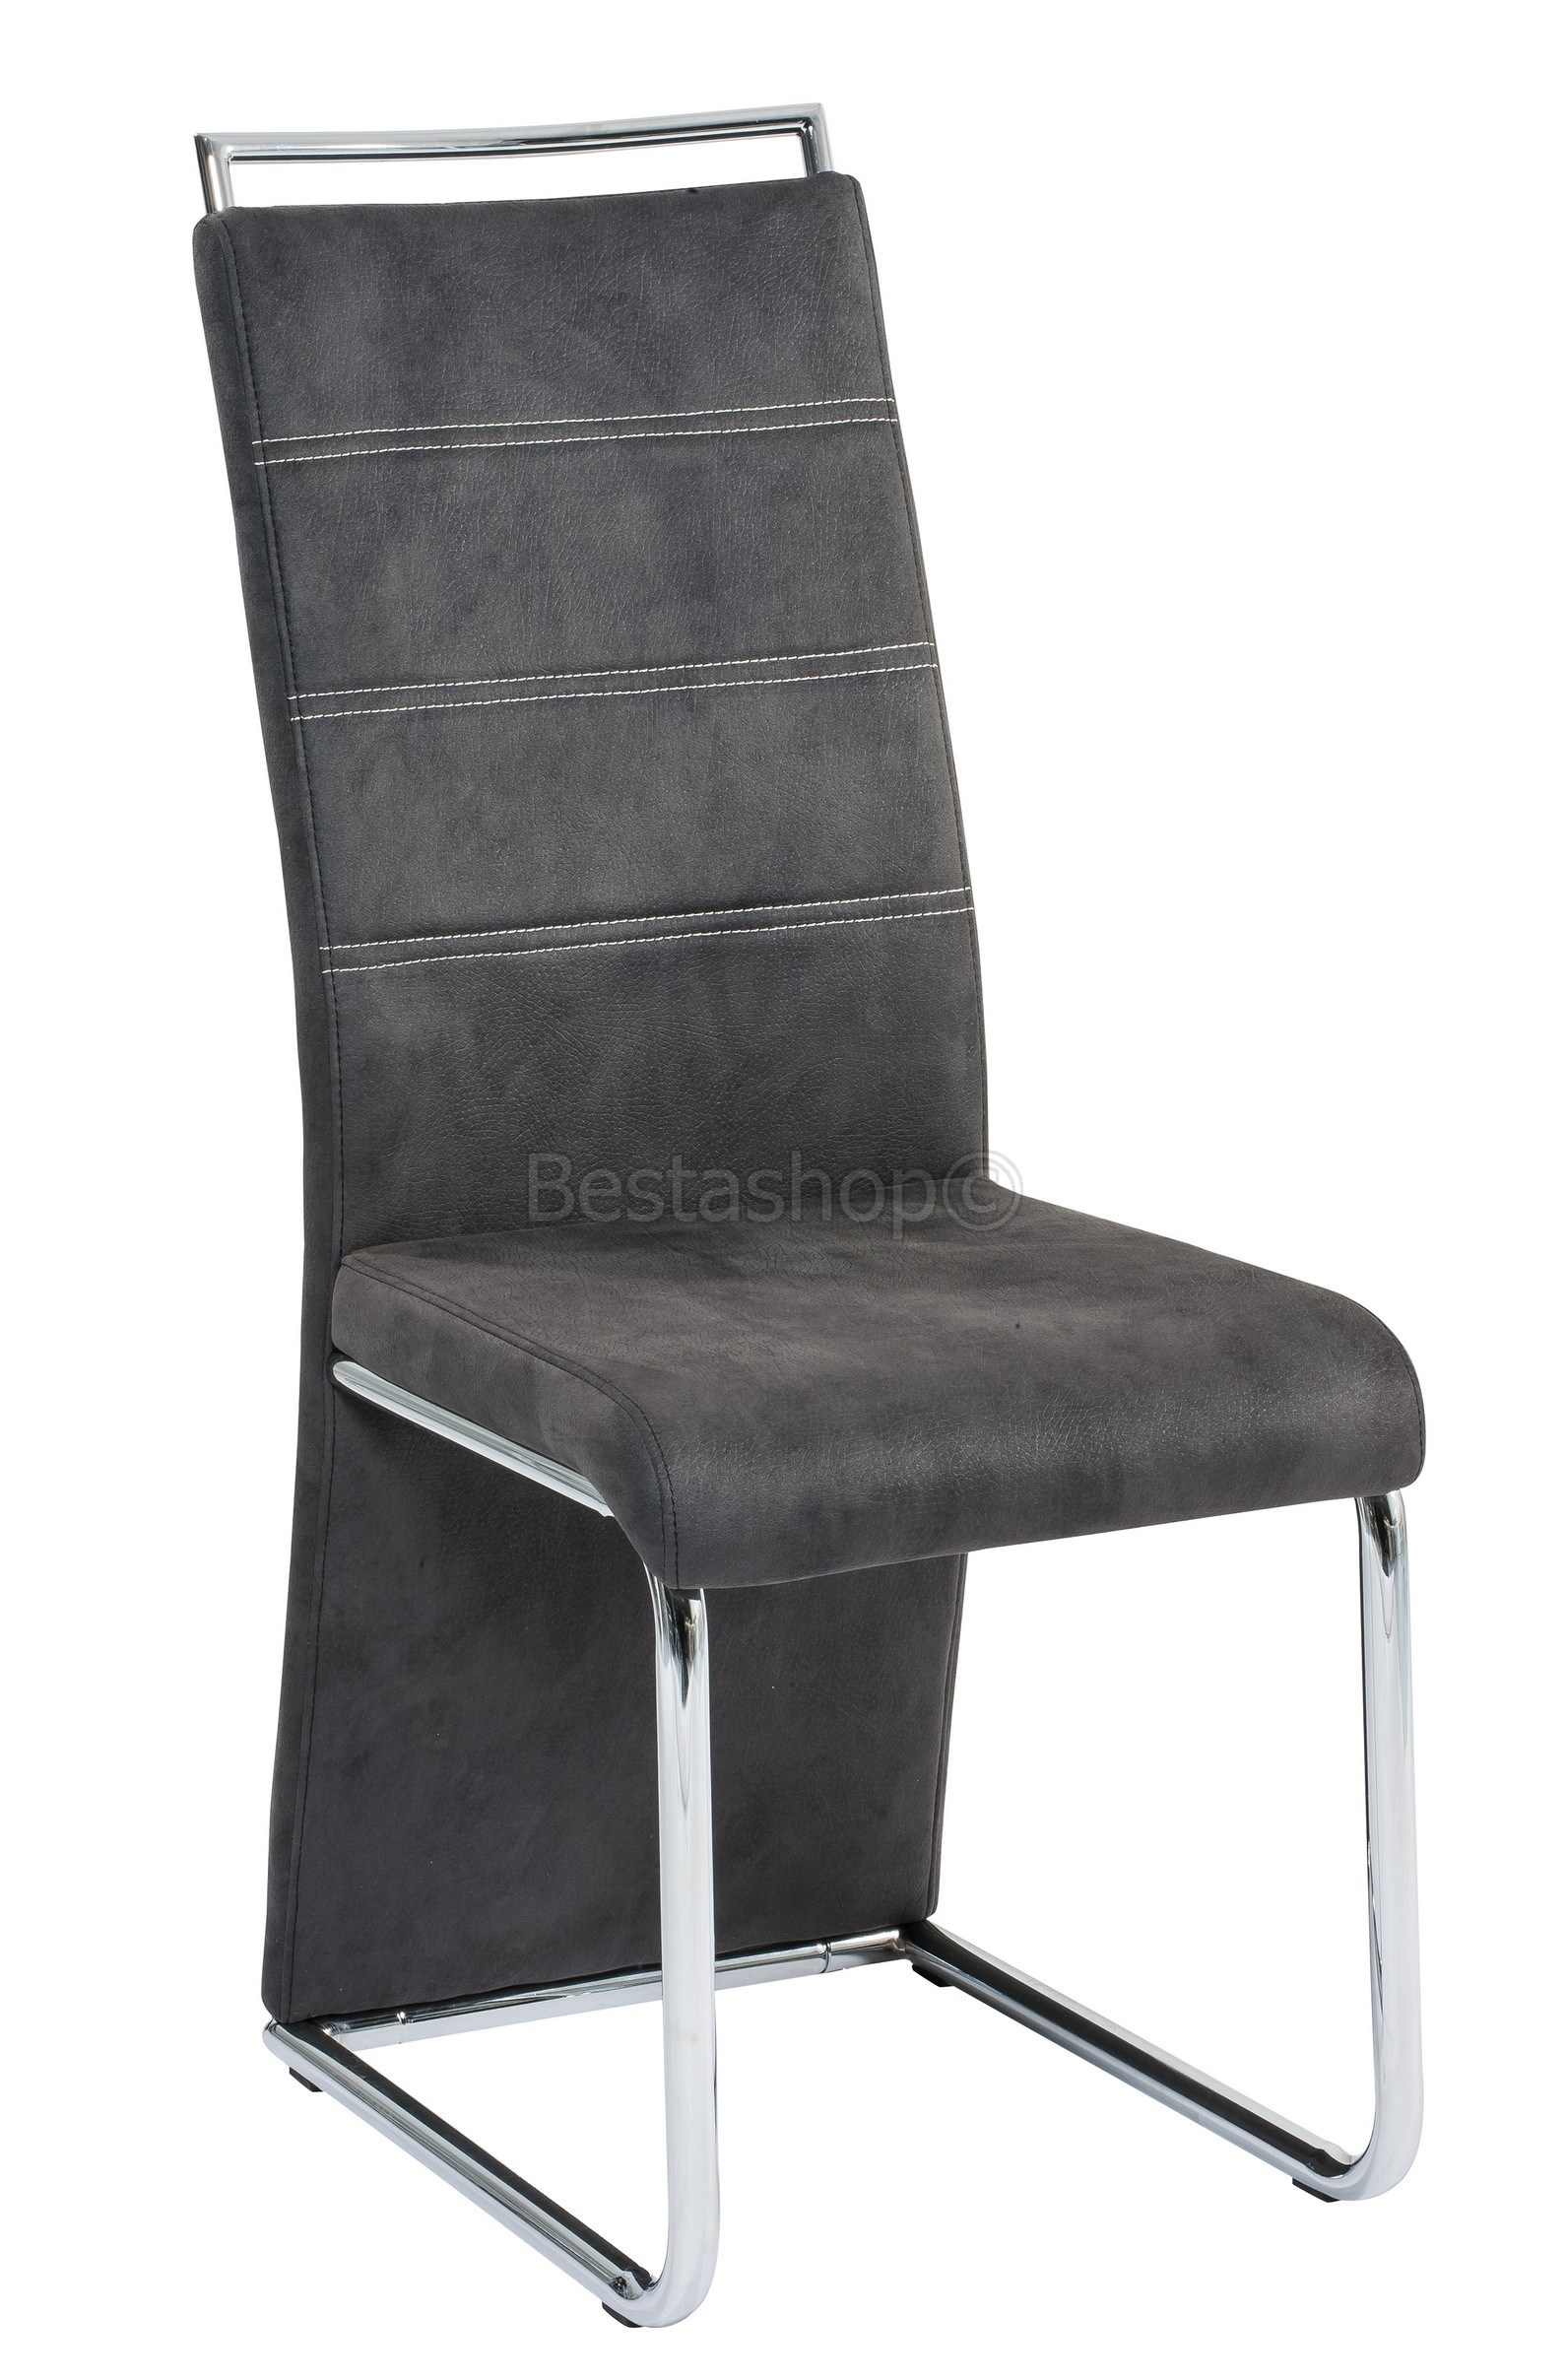 chaises salle a manger cotton polyurethane desing doria ensemble avec charmant theme chaise en rasine tressae